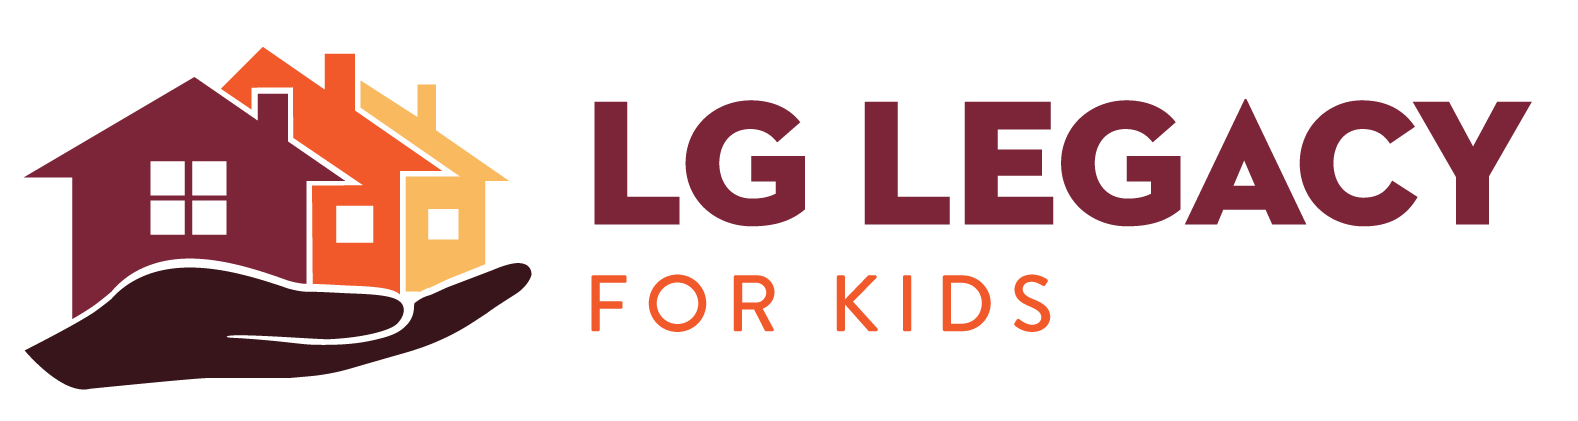 LG Legacy for Kids